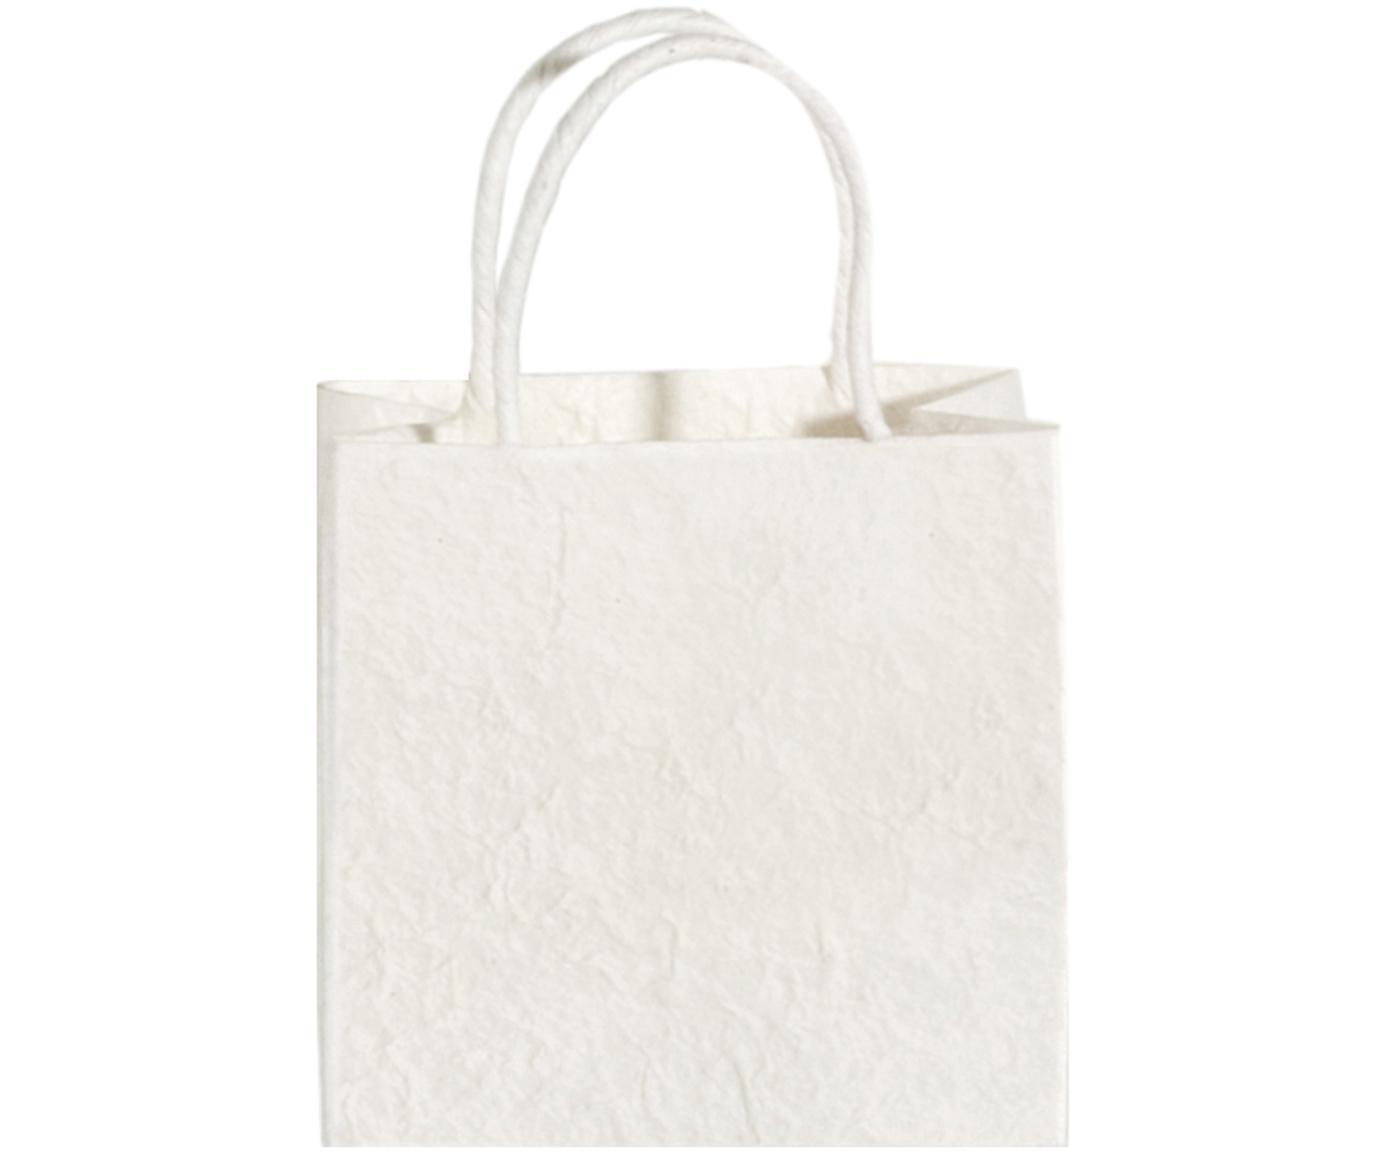 Geschenktassen Will, 3 stuks, Papier, Wit, crèmekleurig, 20 x 20 cm